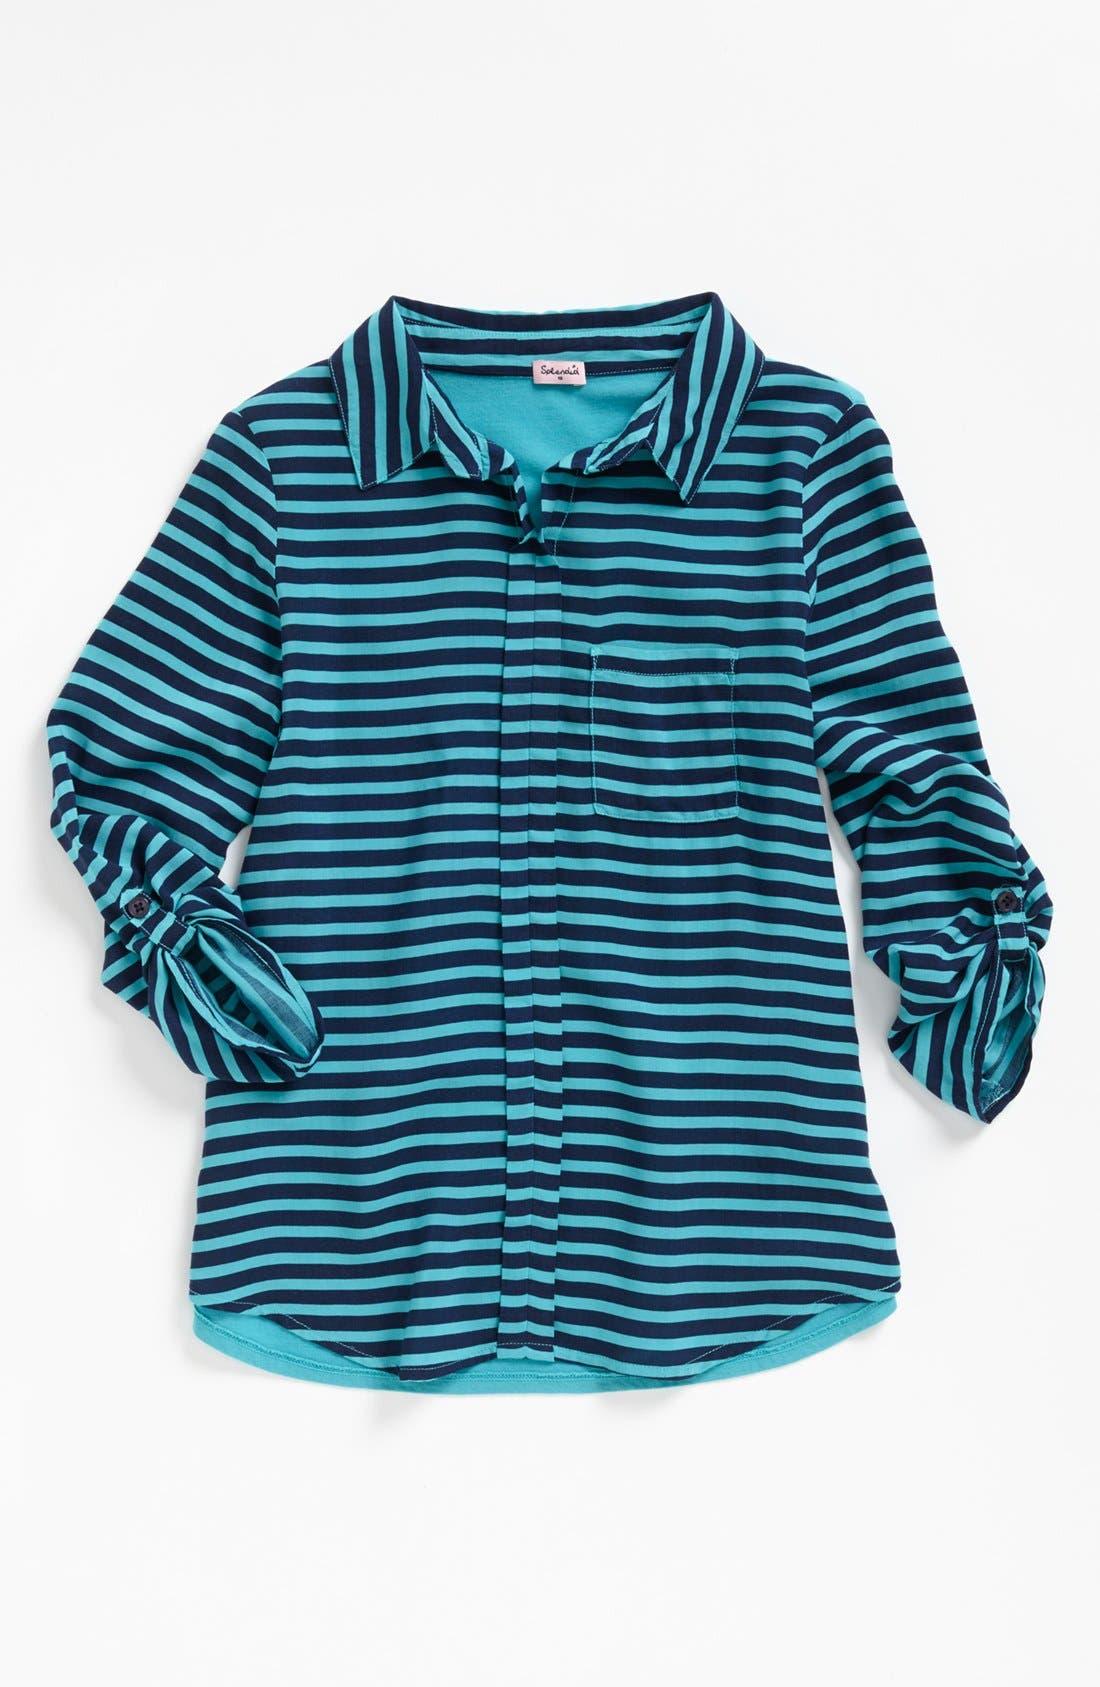 Alternate Image 1 Selected - Splendid Stripe Rugby Shirt (Big Girls)